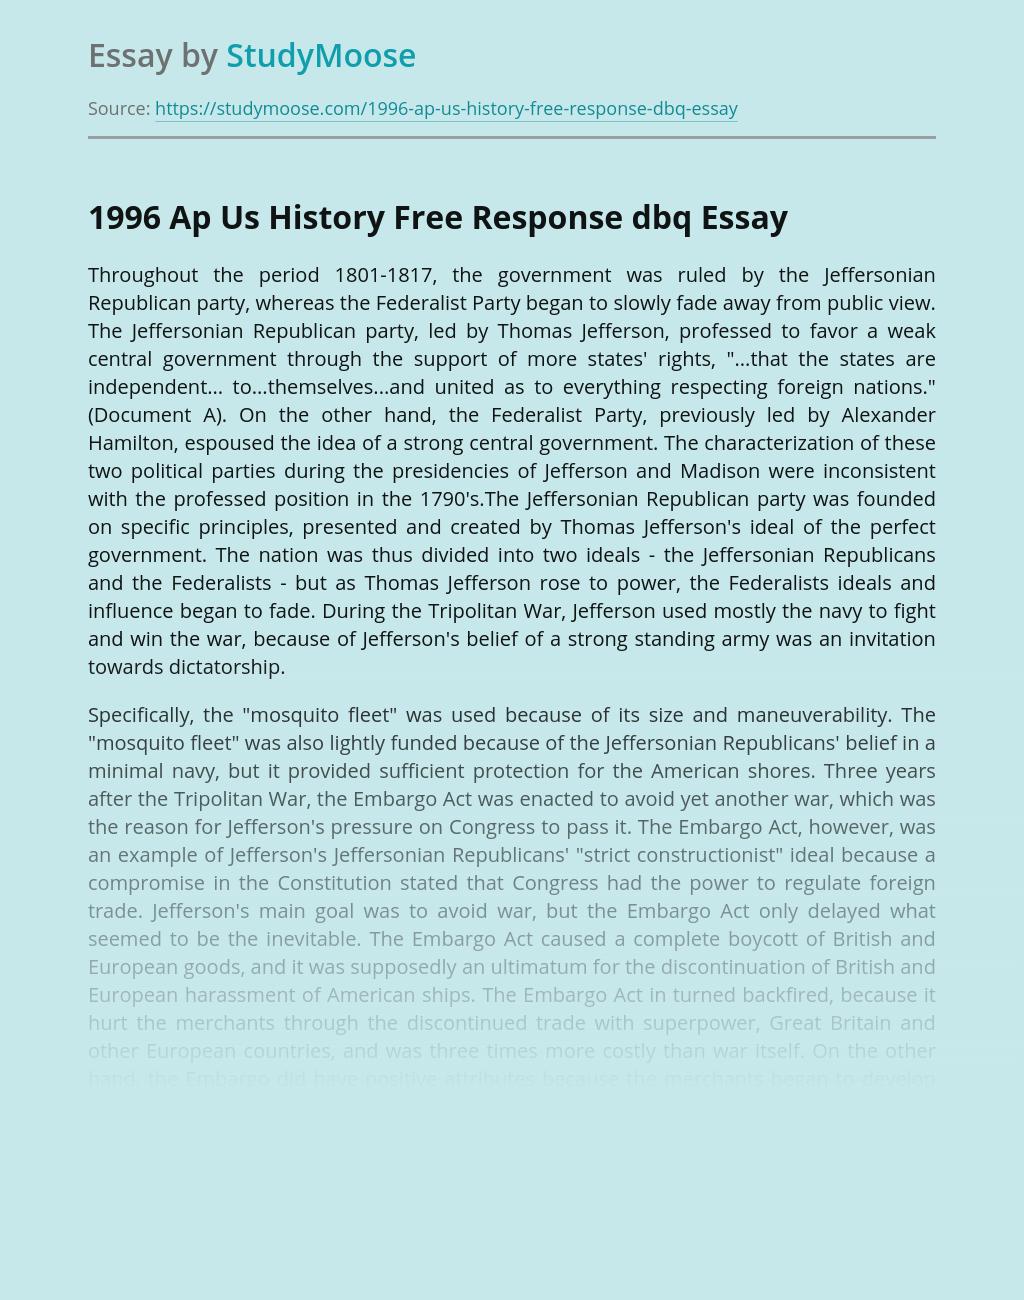 1996 Ap Us History Free Response dbq